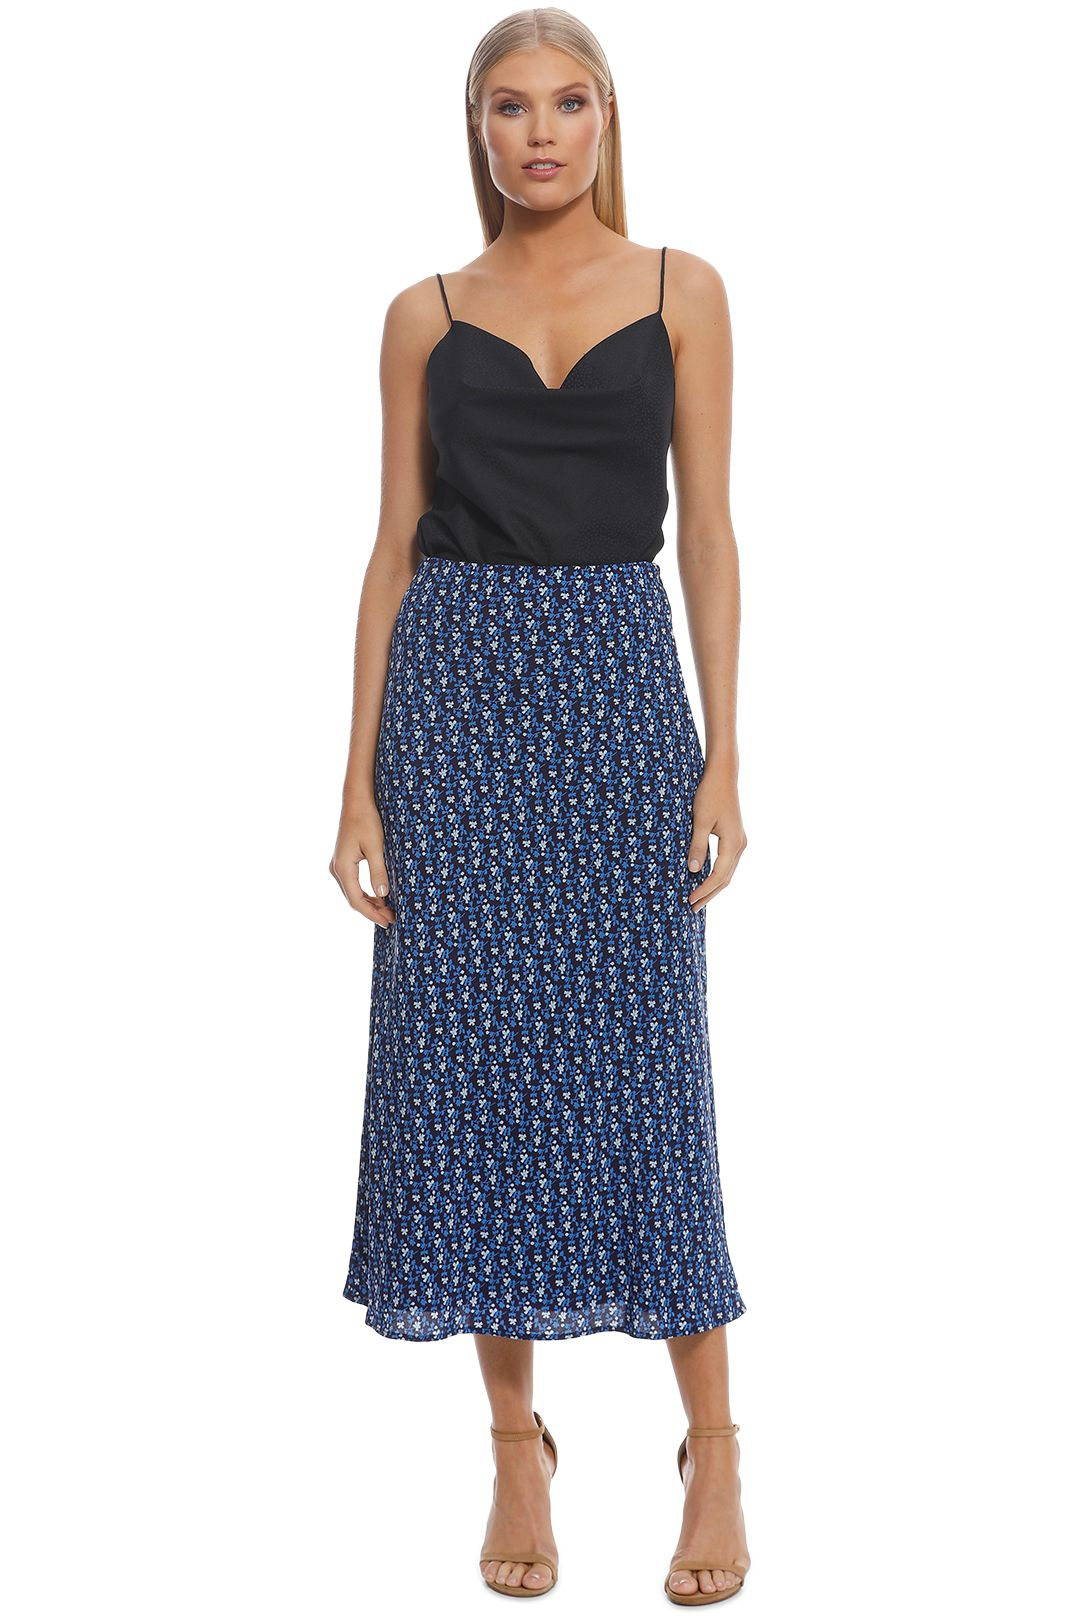 CMEO Collective - Sanguine Skirt - Dark Blue Floral - Front